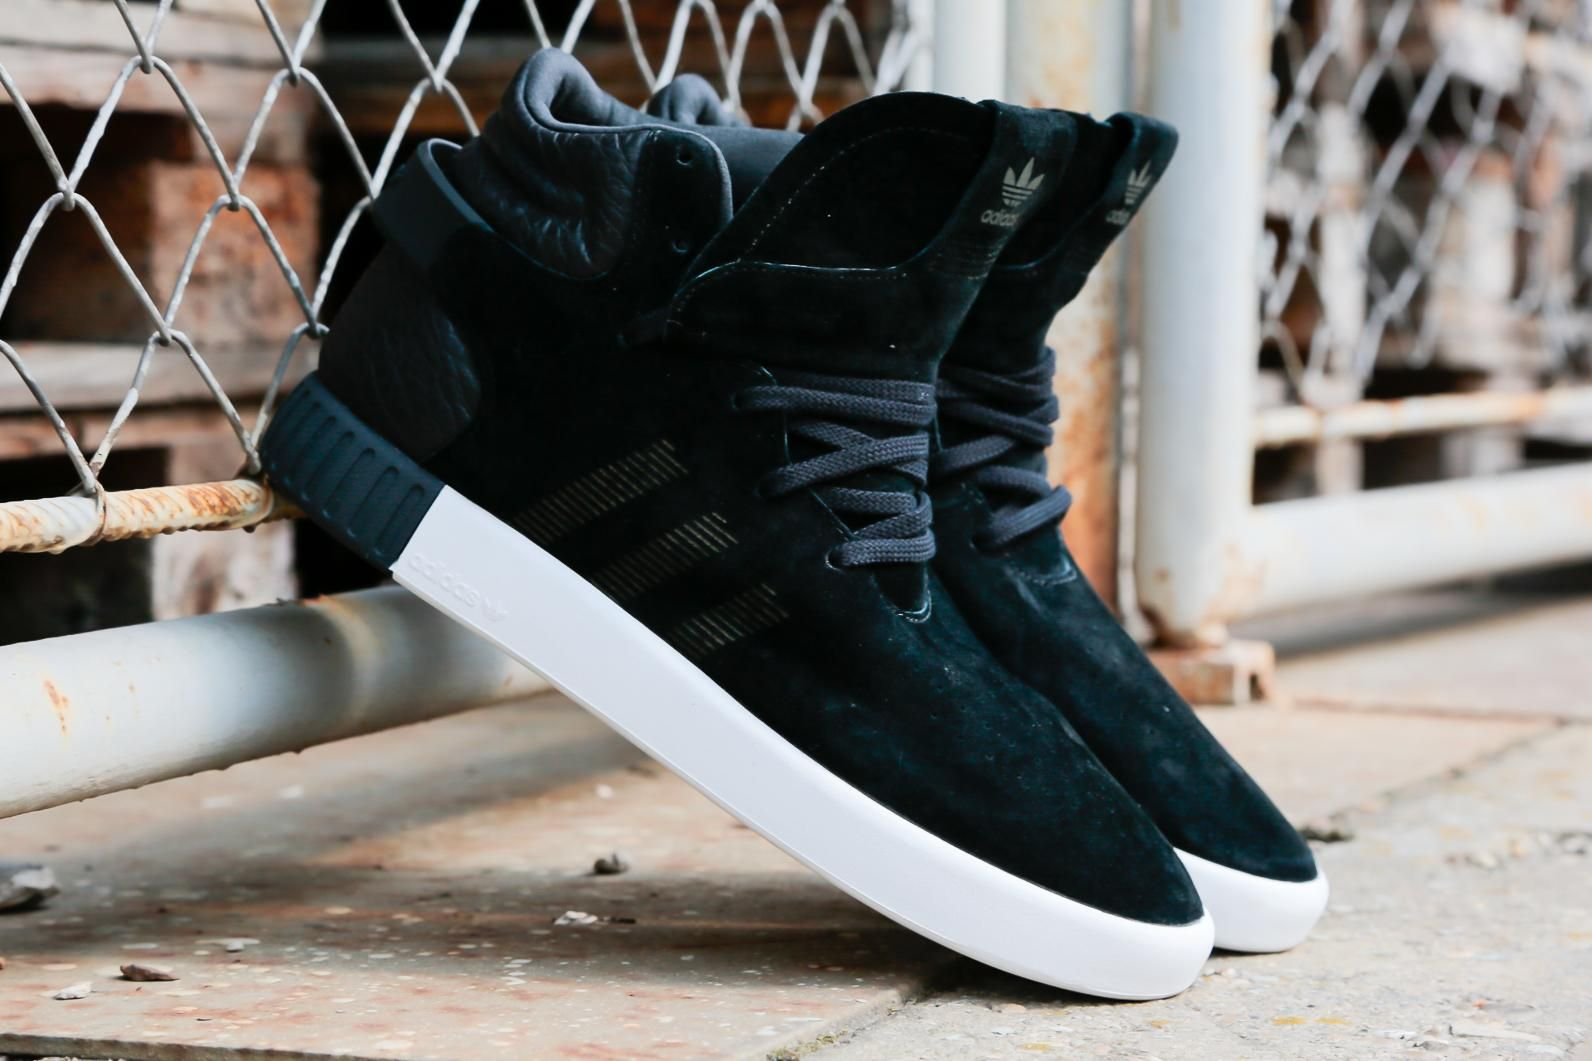 Adidas Tubular Invader Strap Casual Shoes